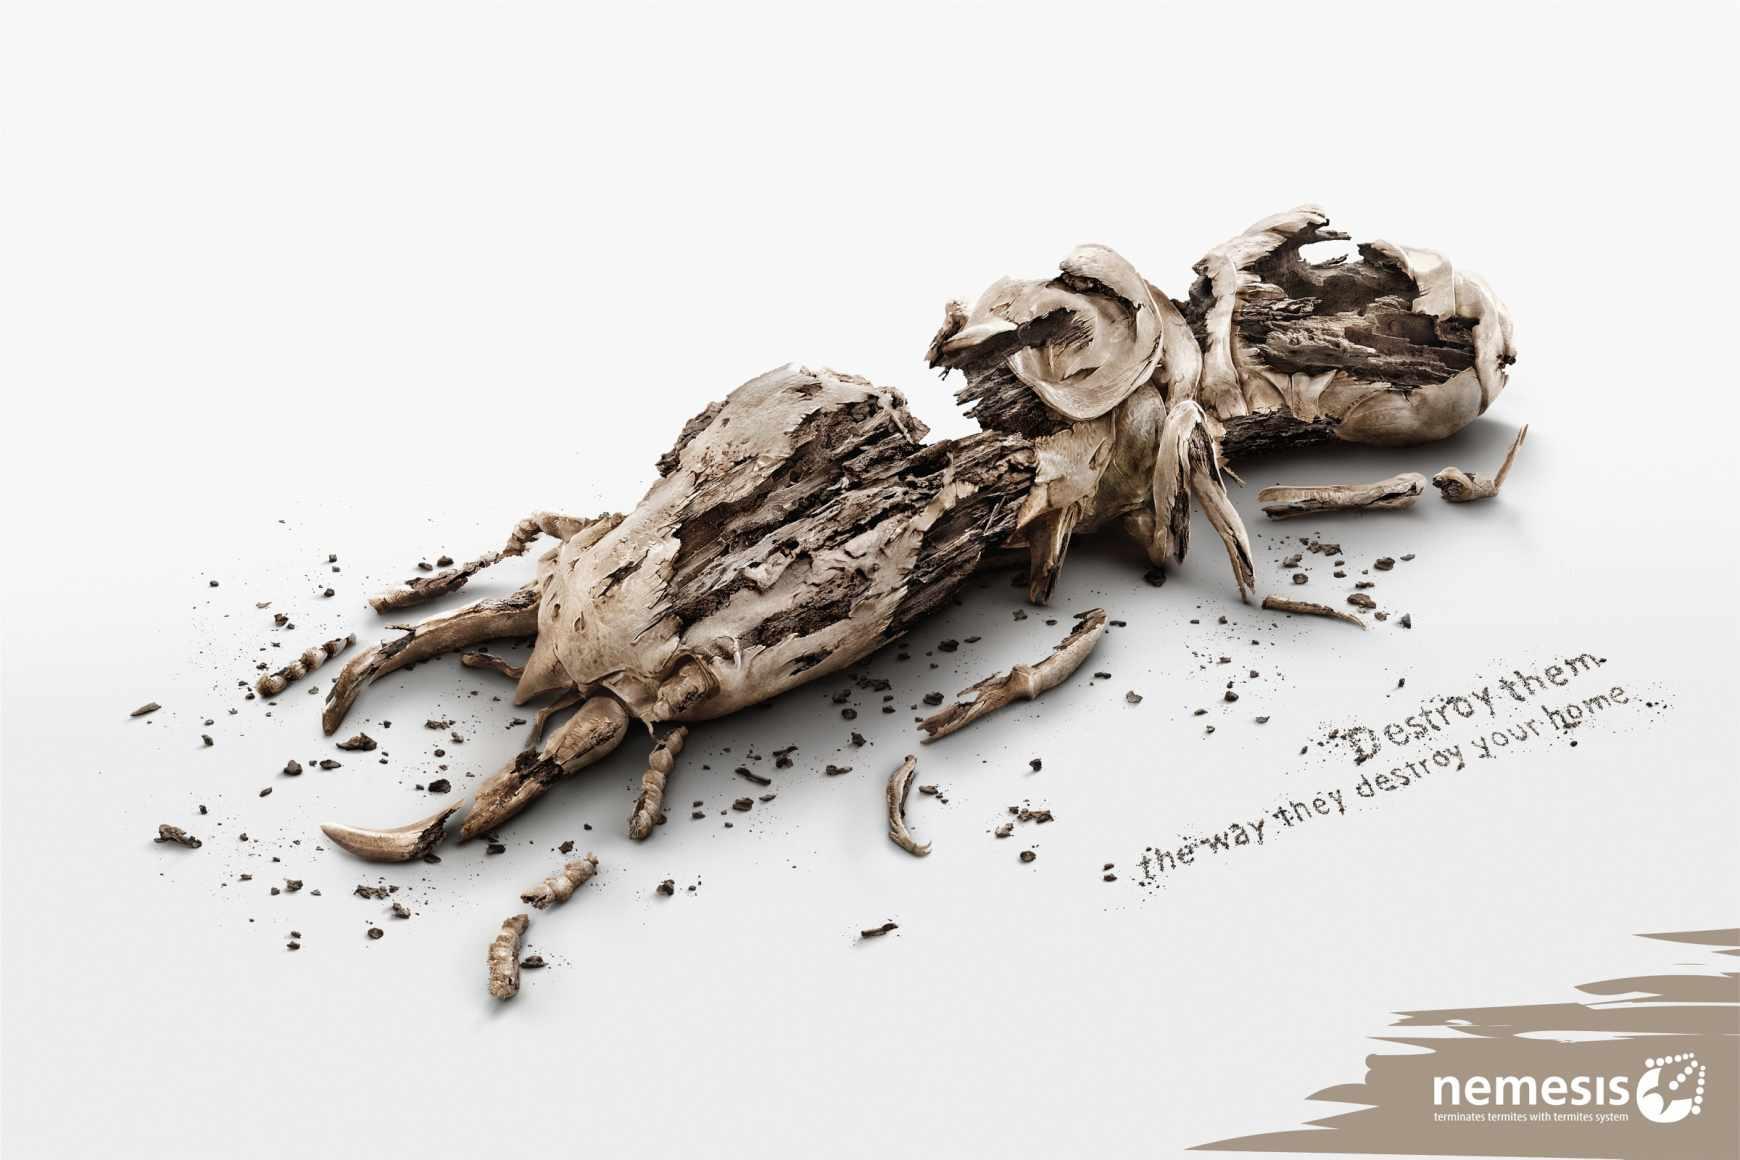 soldier_-_nemesis_termites_system_rgb_aotw